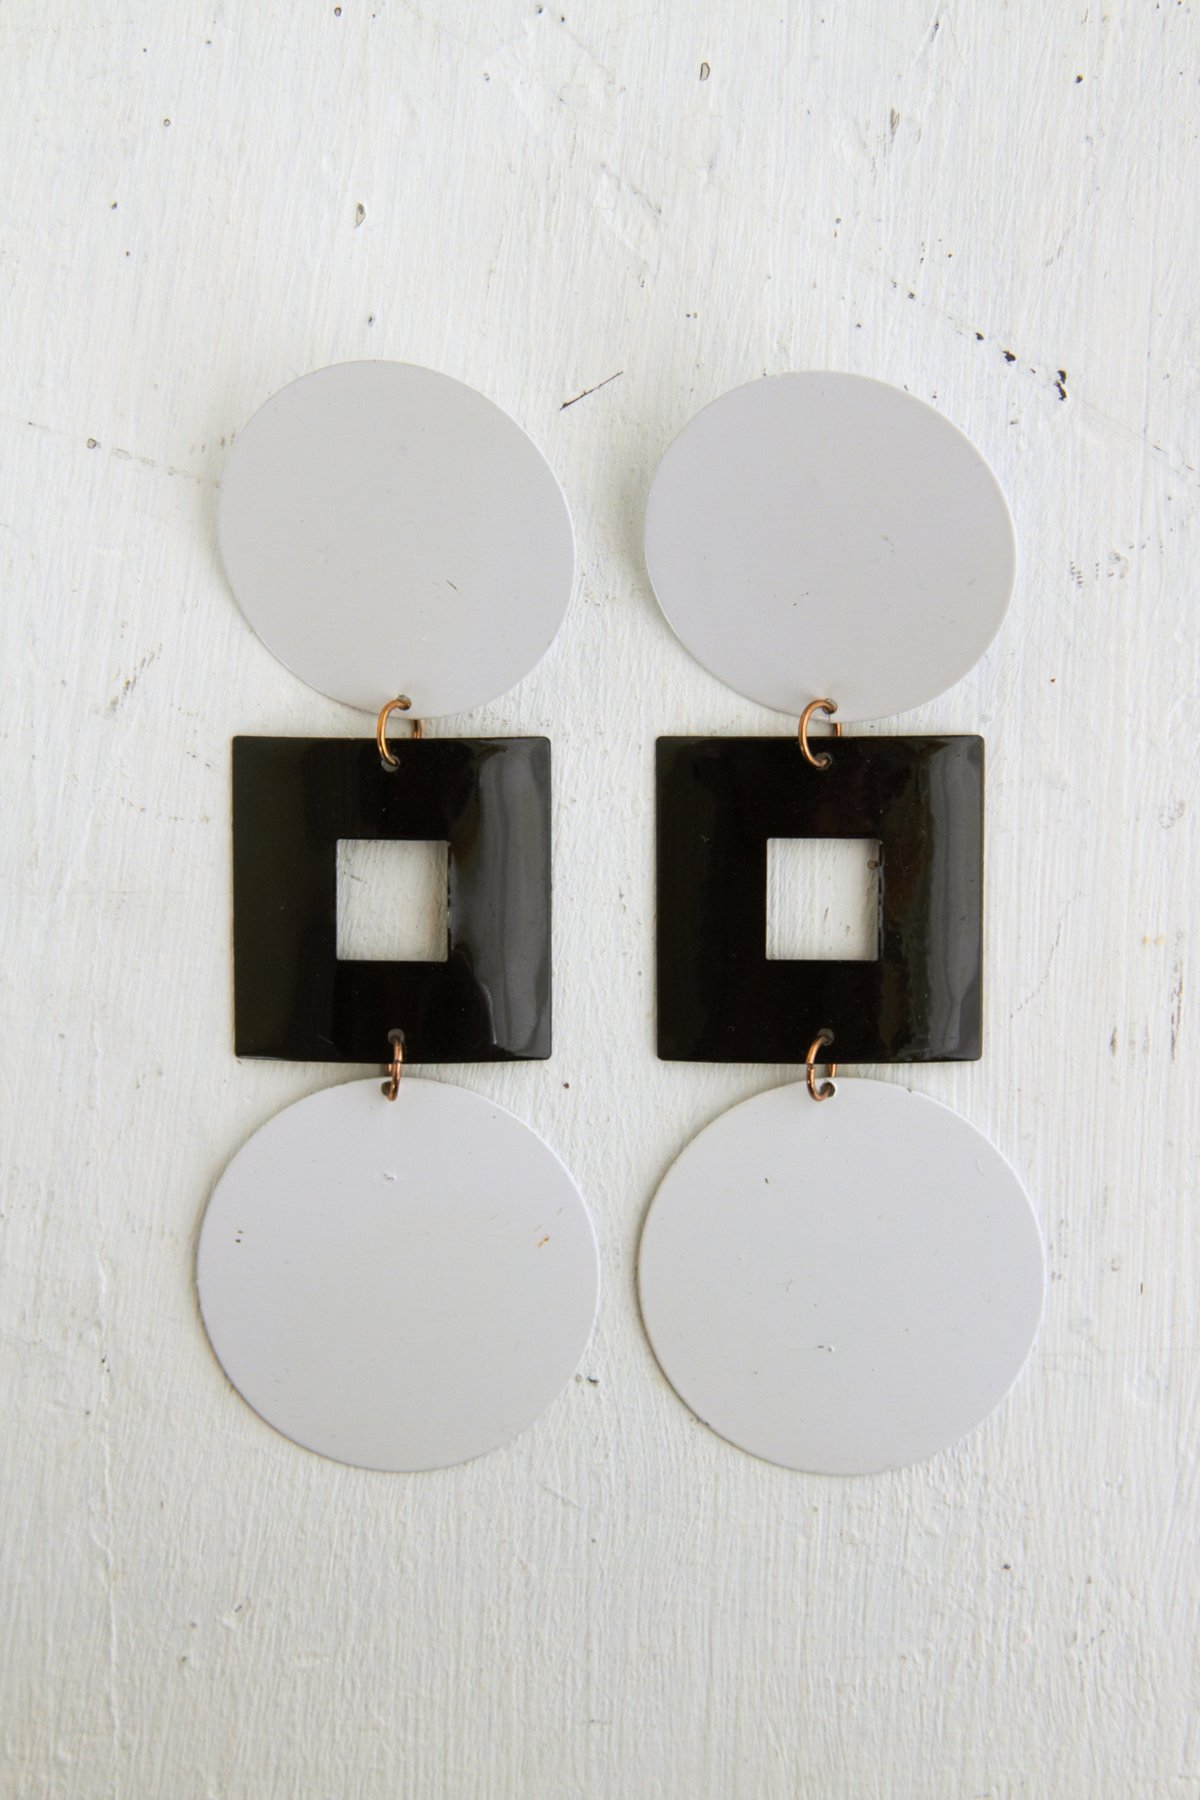 Vintage Circle Square Mod Dangle Earrings